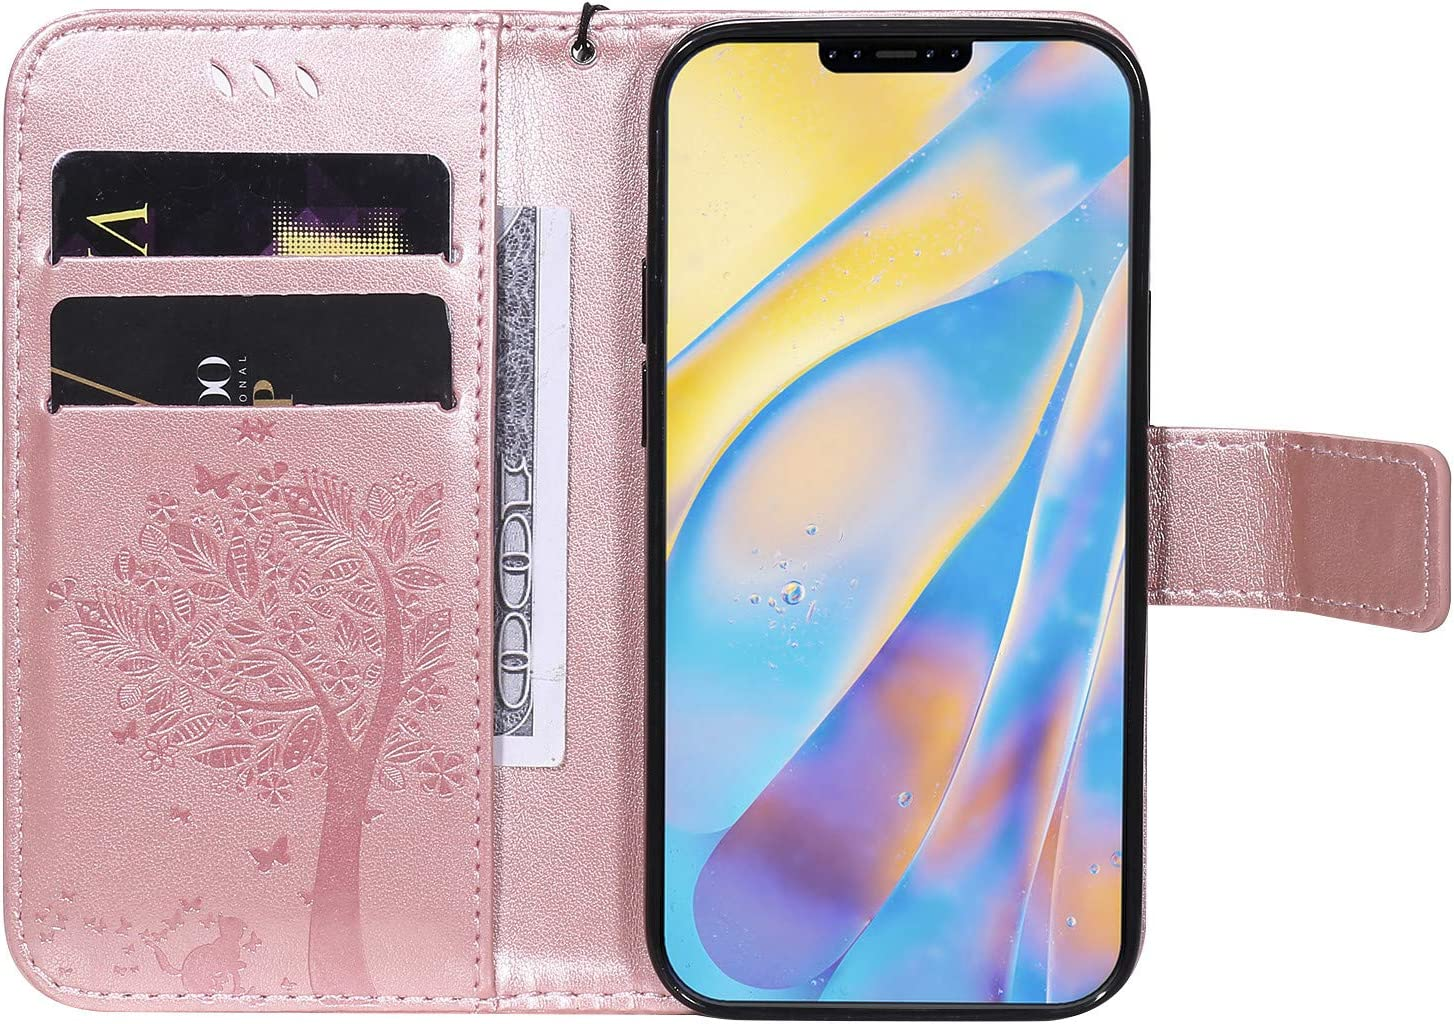 Nancencen Compatible With Handyhülle Iphone 12 Mini Elektronik